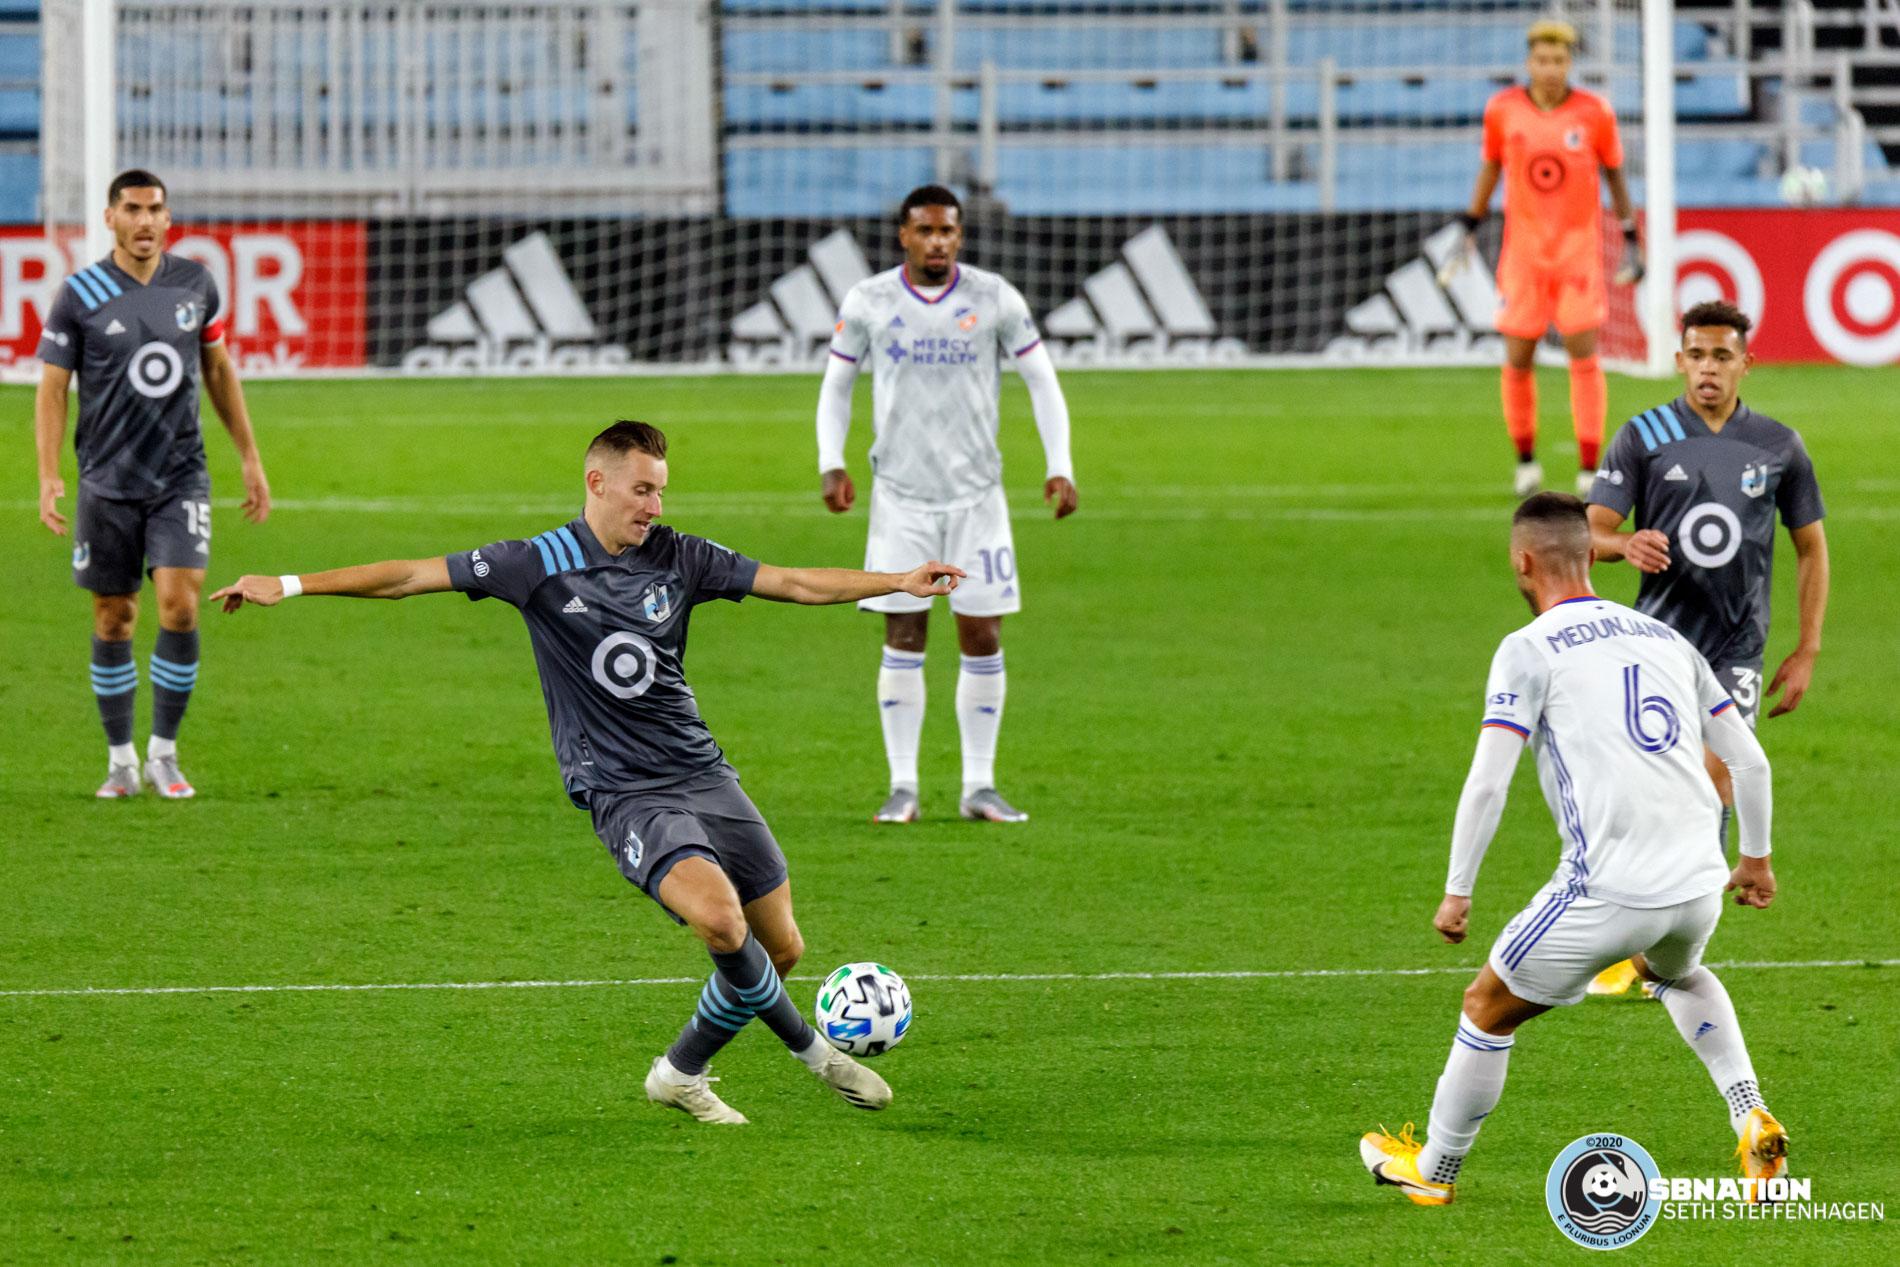 October 3, 2020 - Saint Paul, Minnesota, United States - Minnesota United midfielder Ján Greguš (8) passes the ball during the match against FC Cincinnati at Allianz Field.